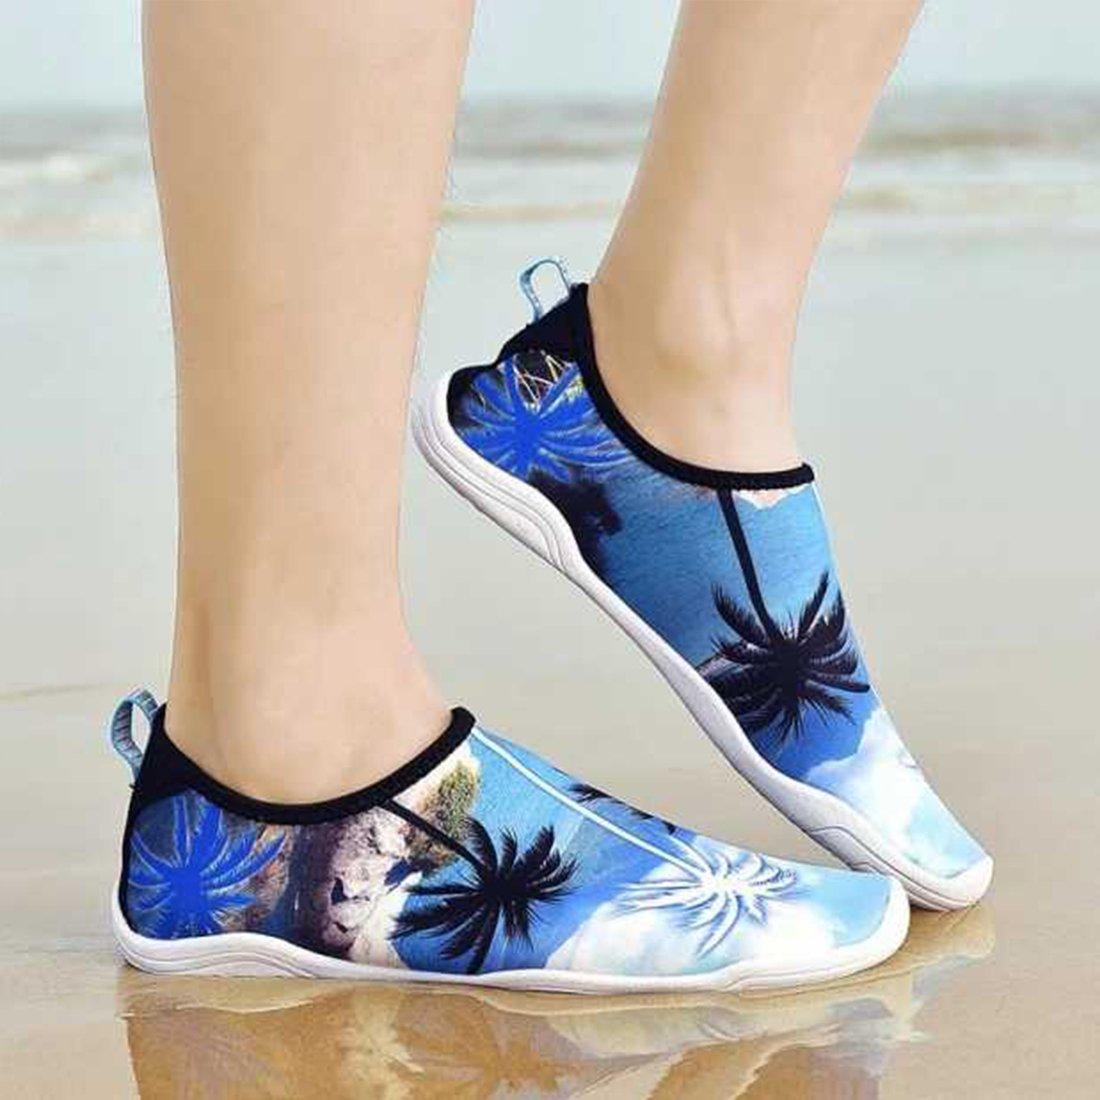 APTRO Womens Mens Water Shoes Barefoot Beach Swimming Walking Palm Tree Blue US (W:8.5)-(M:7.5)